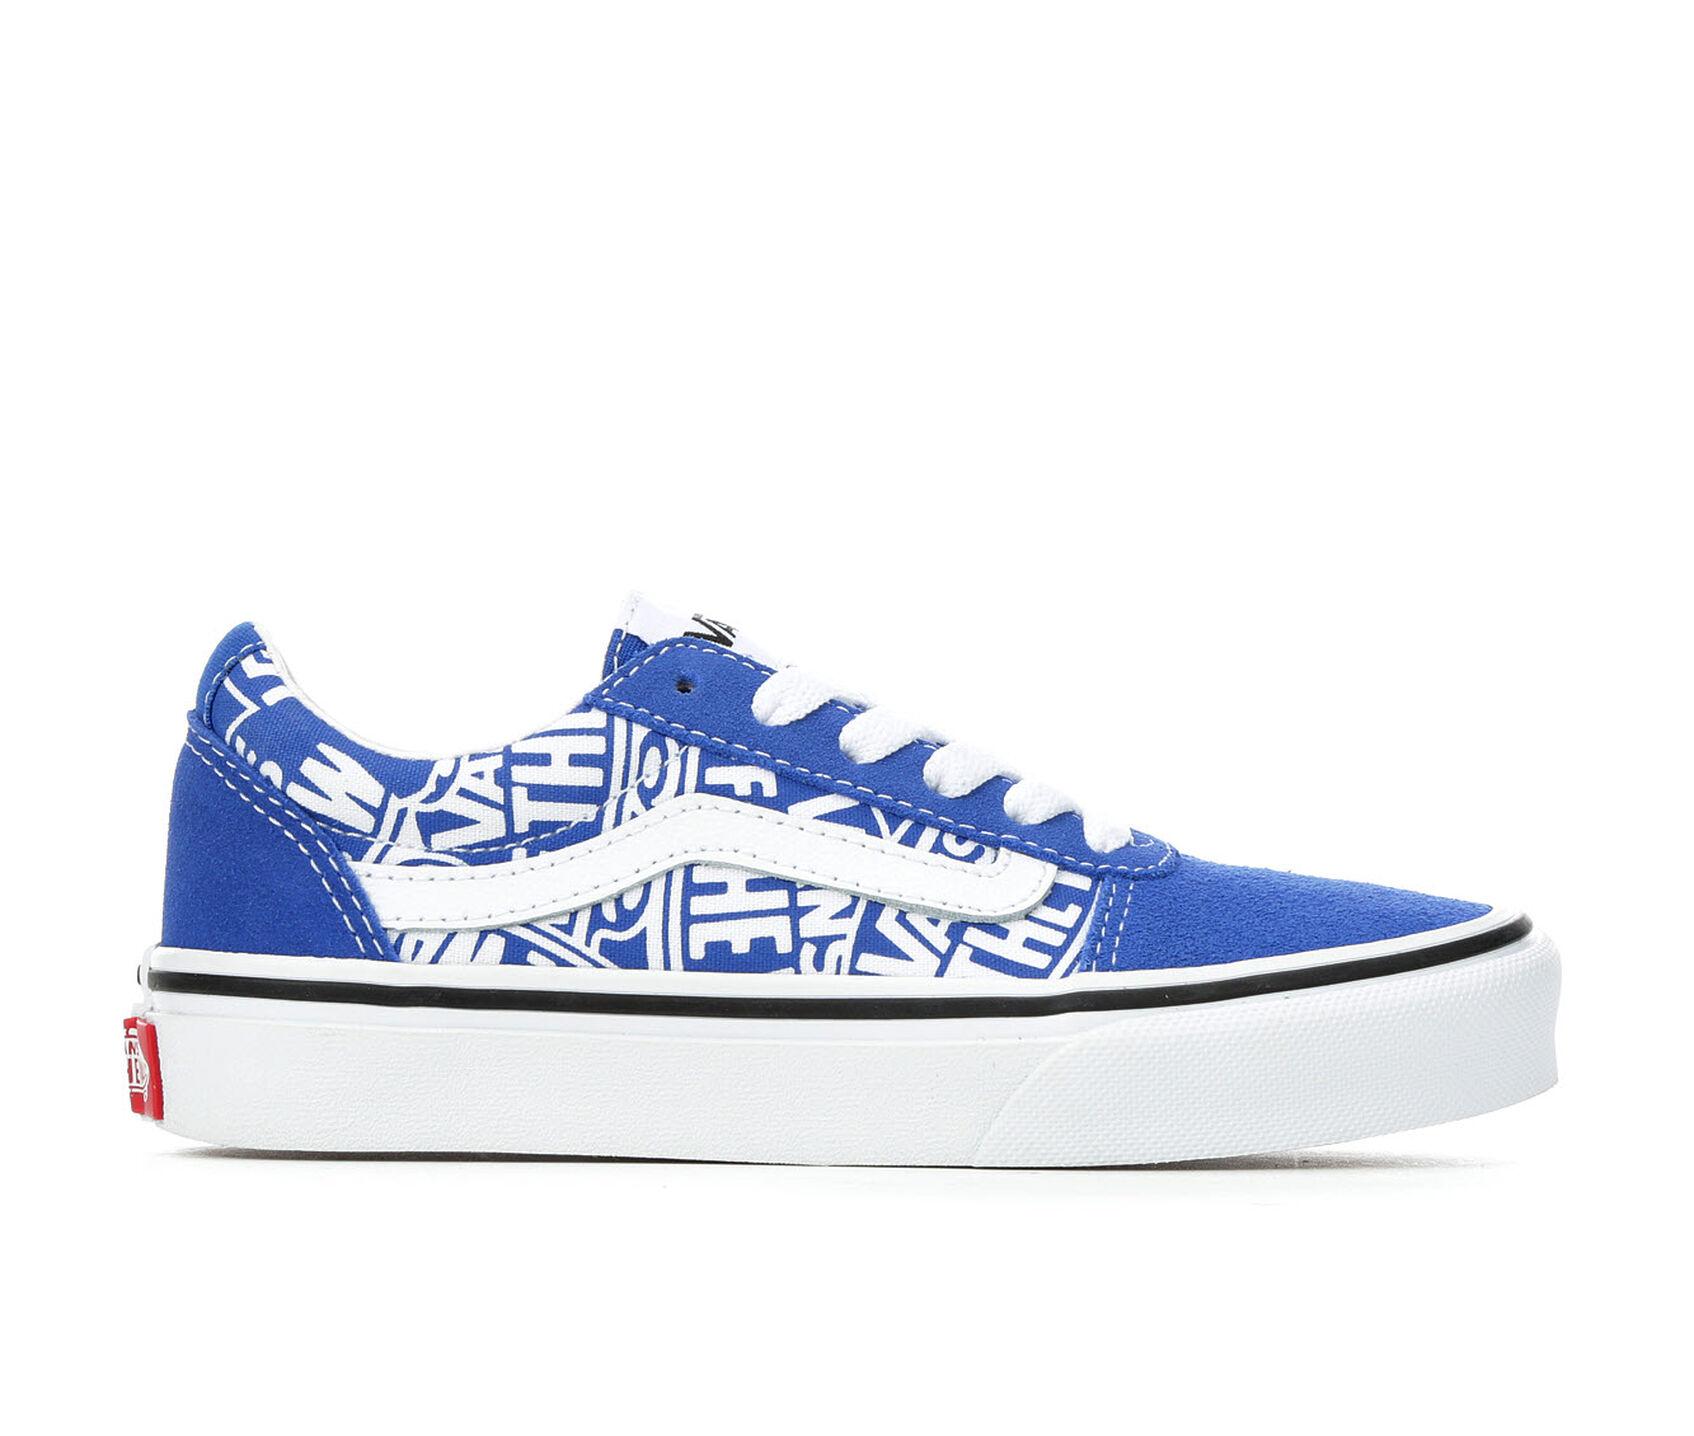 Kids' Vans Little Kid & Big Kid Ward Skate Shoes | Shoe ...